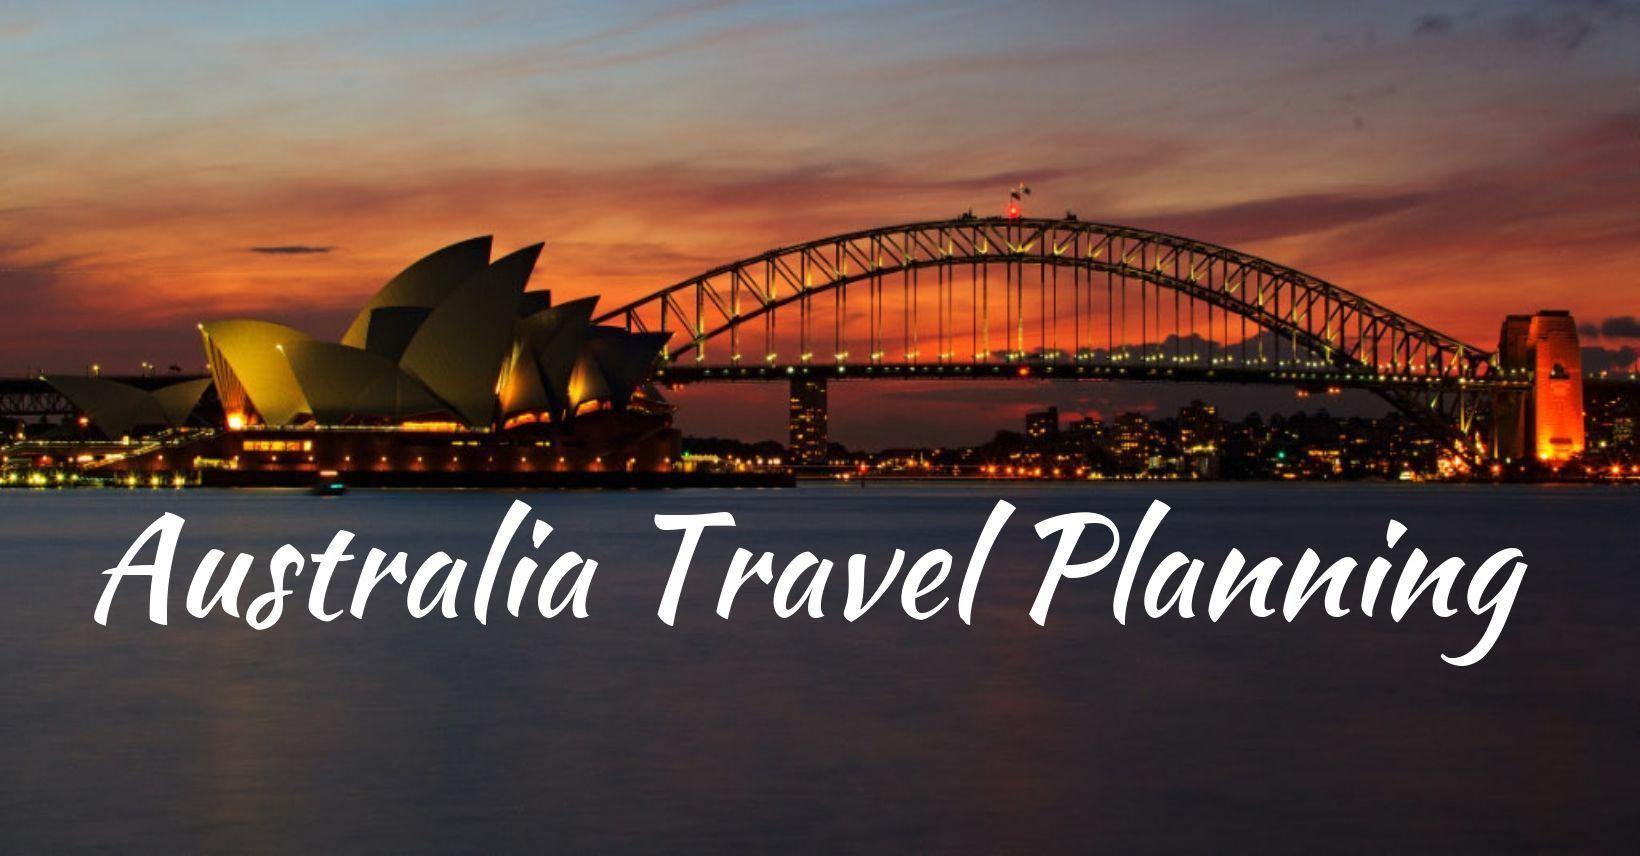 Australia Travel Planning Facebook Group